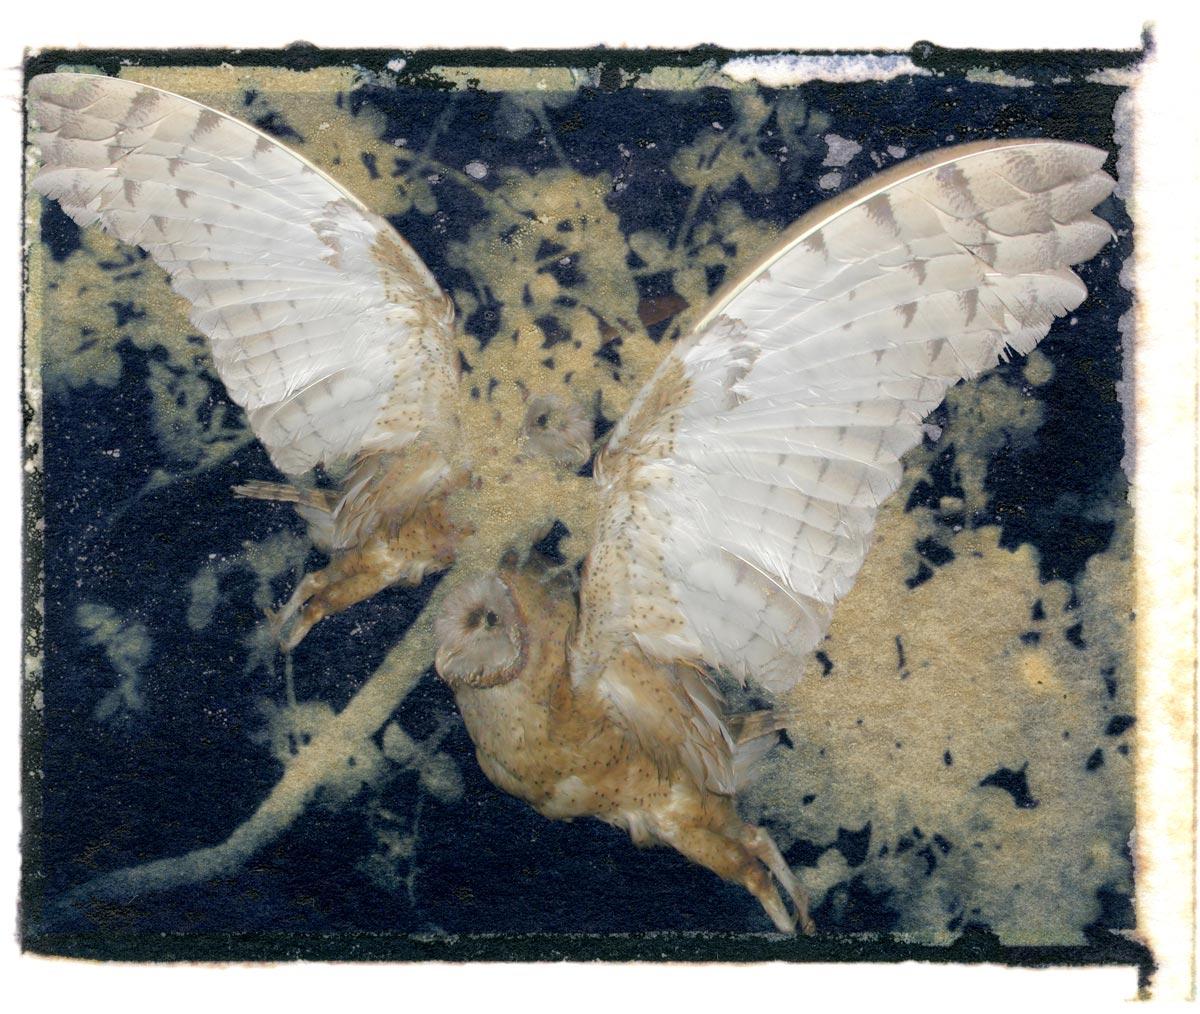 Sandi Daniel Flying Owls @ Stu-Art Supplies